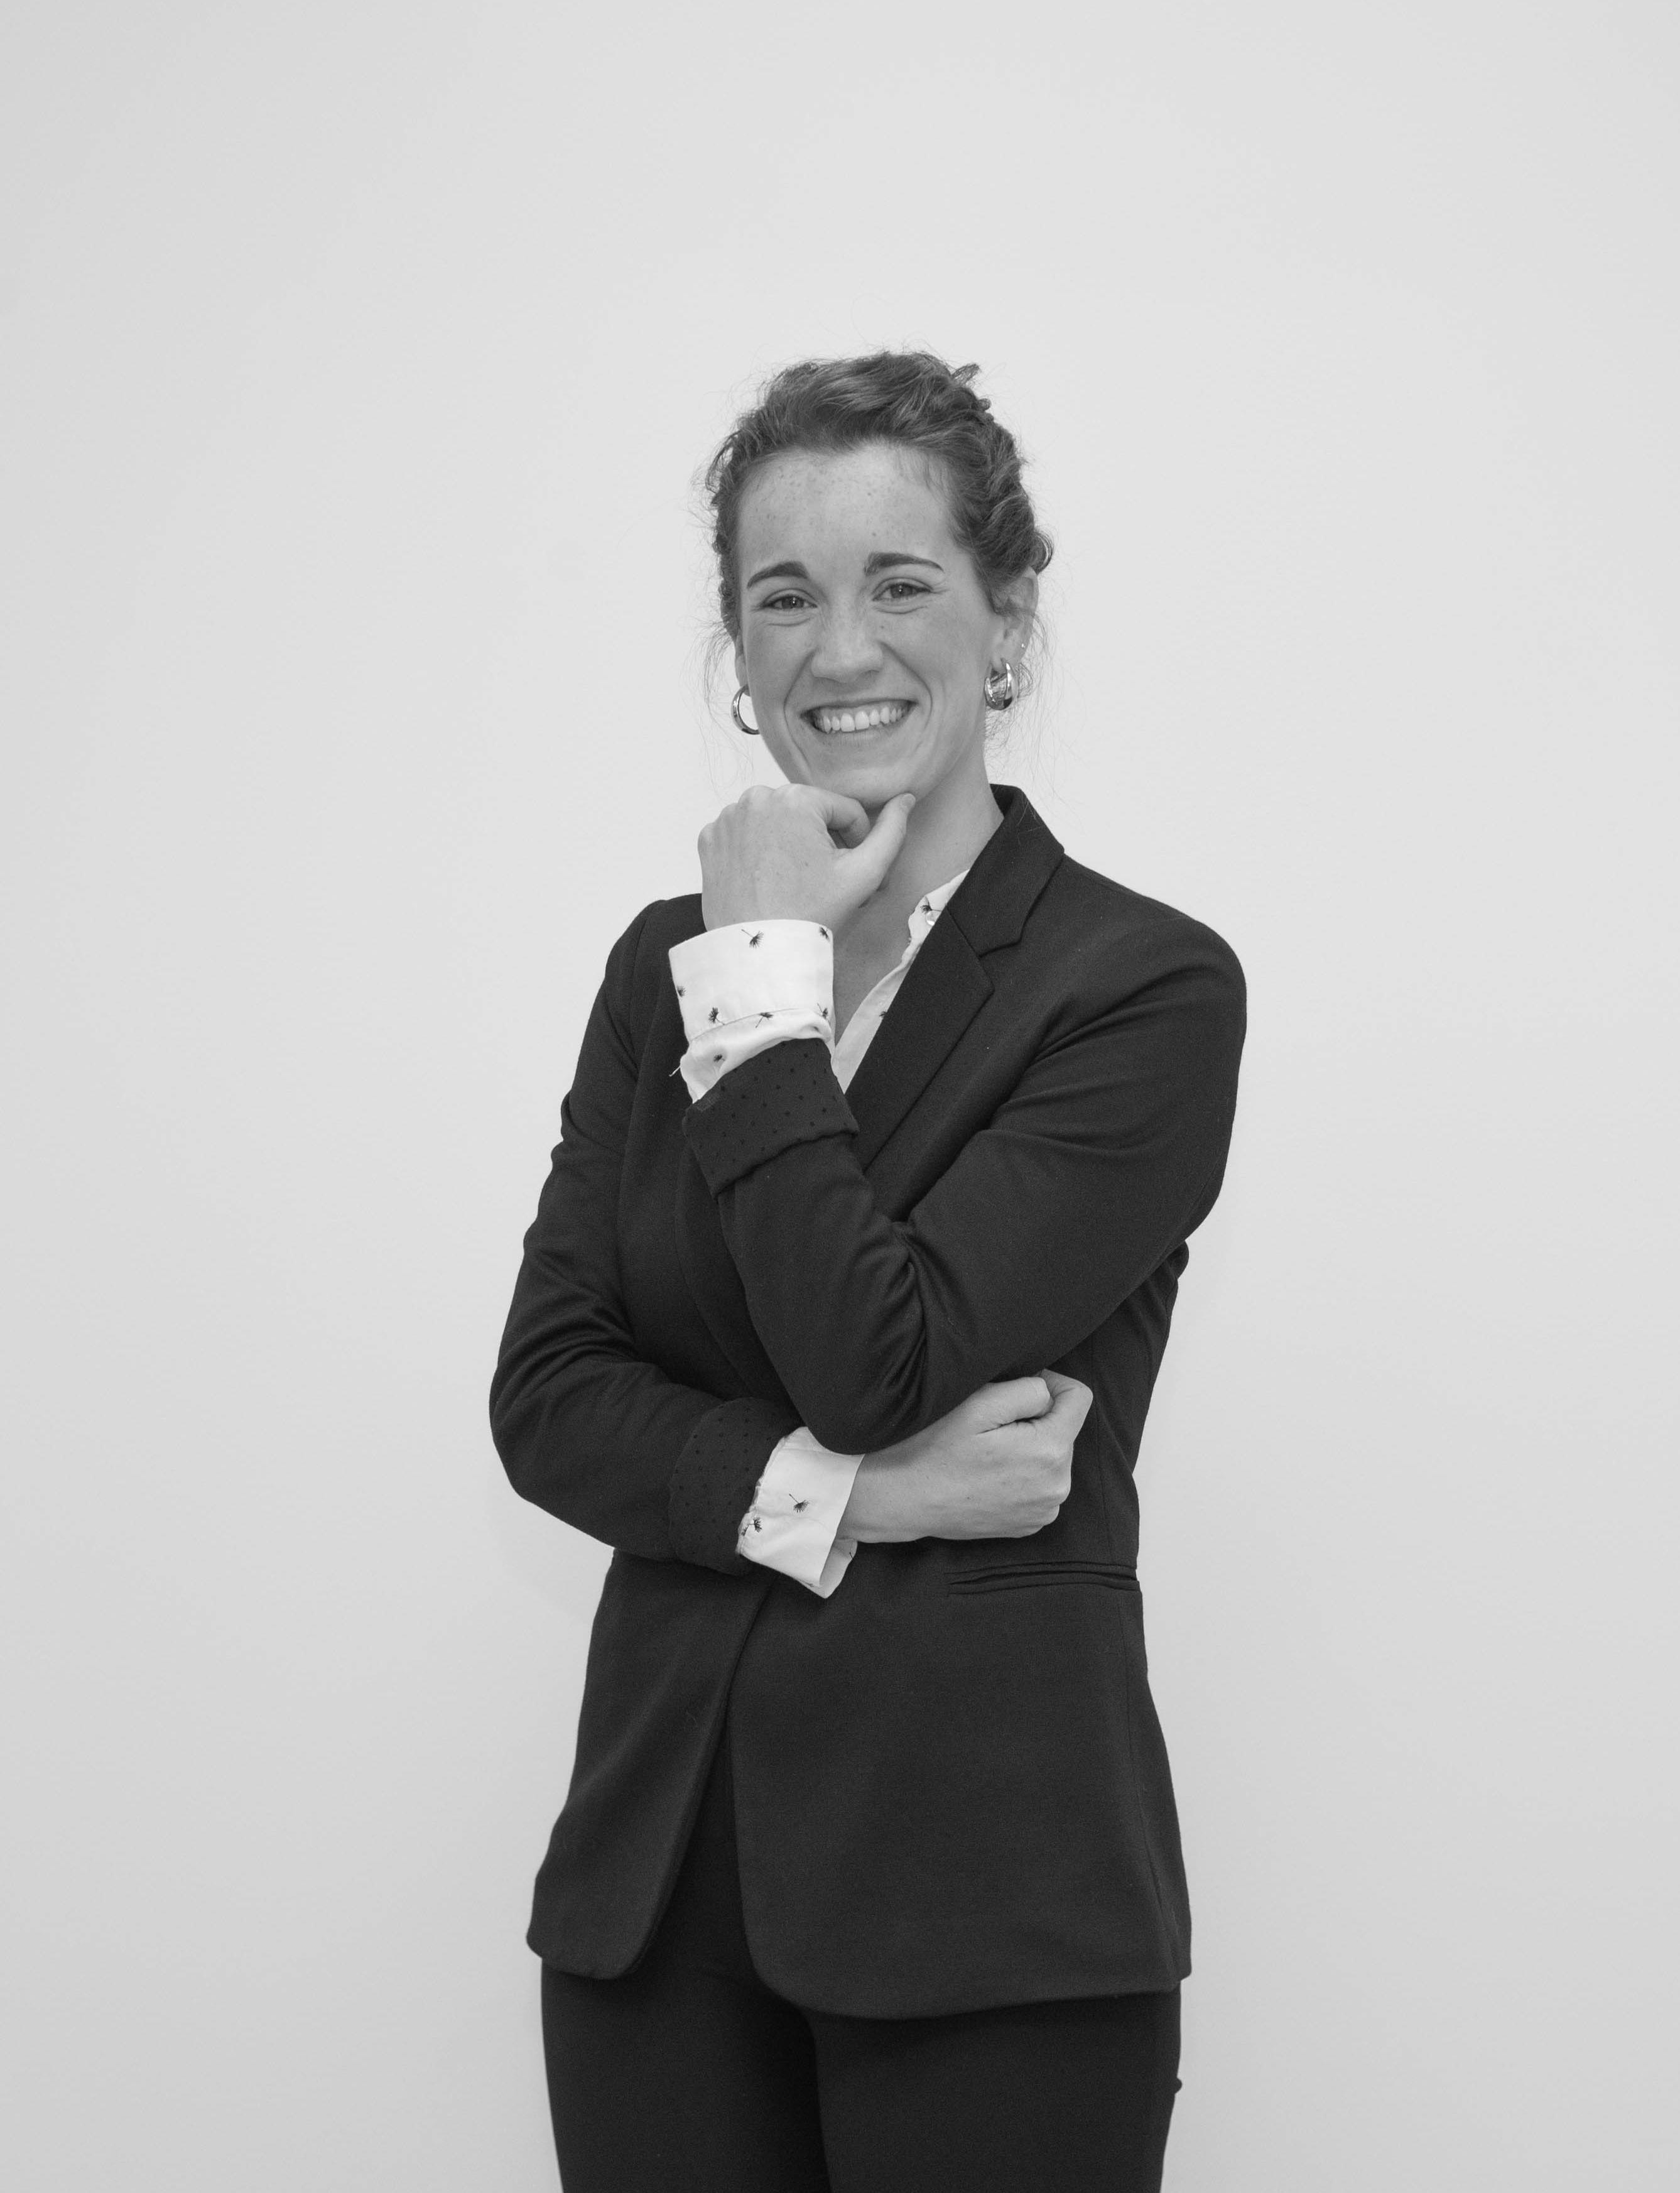 Irenka Chasco